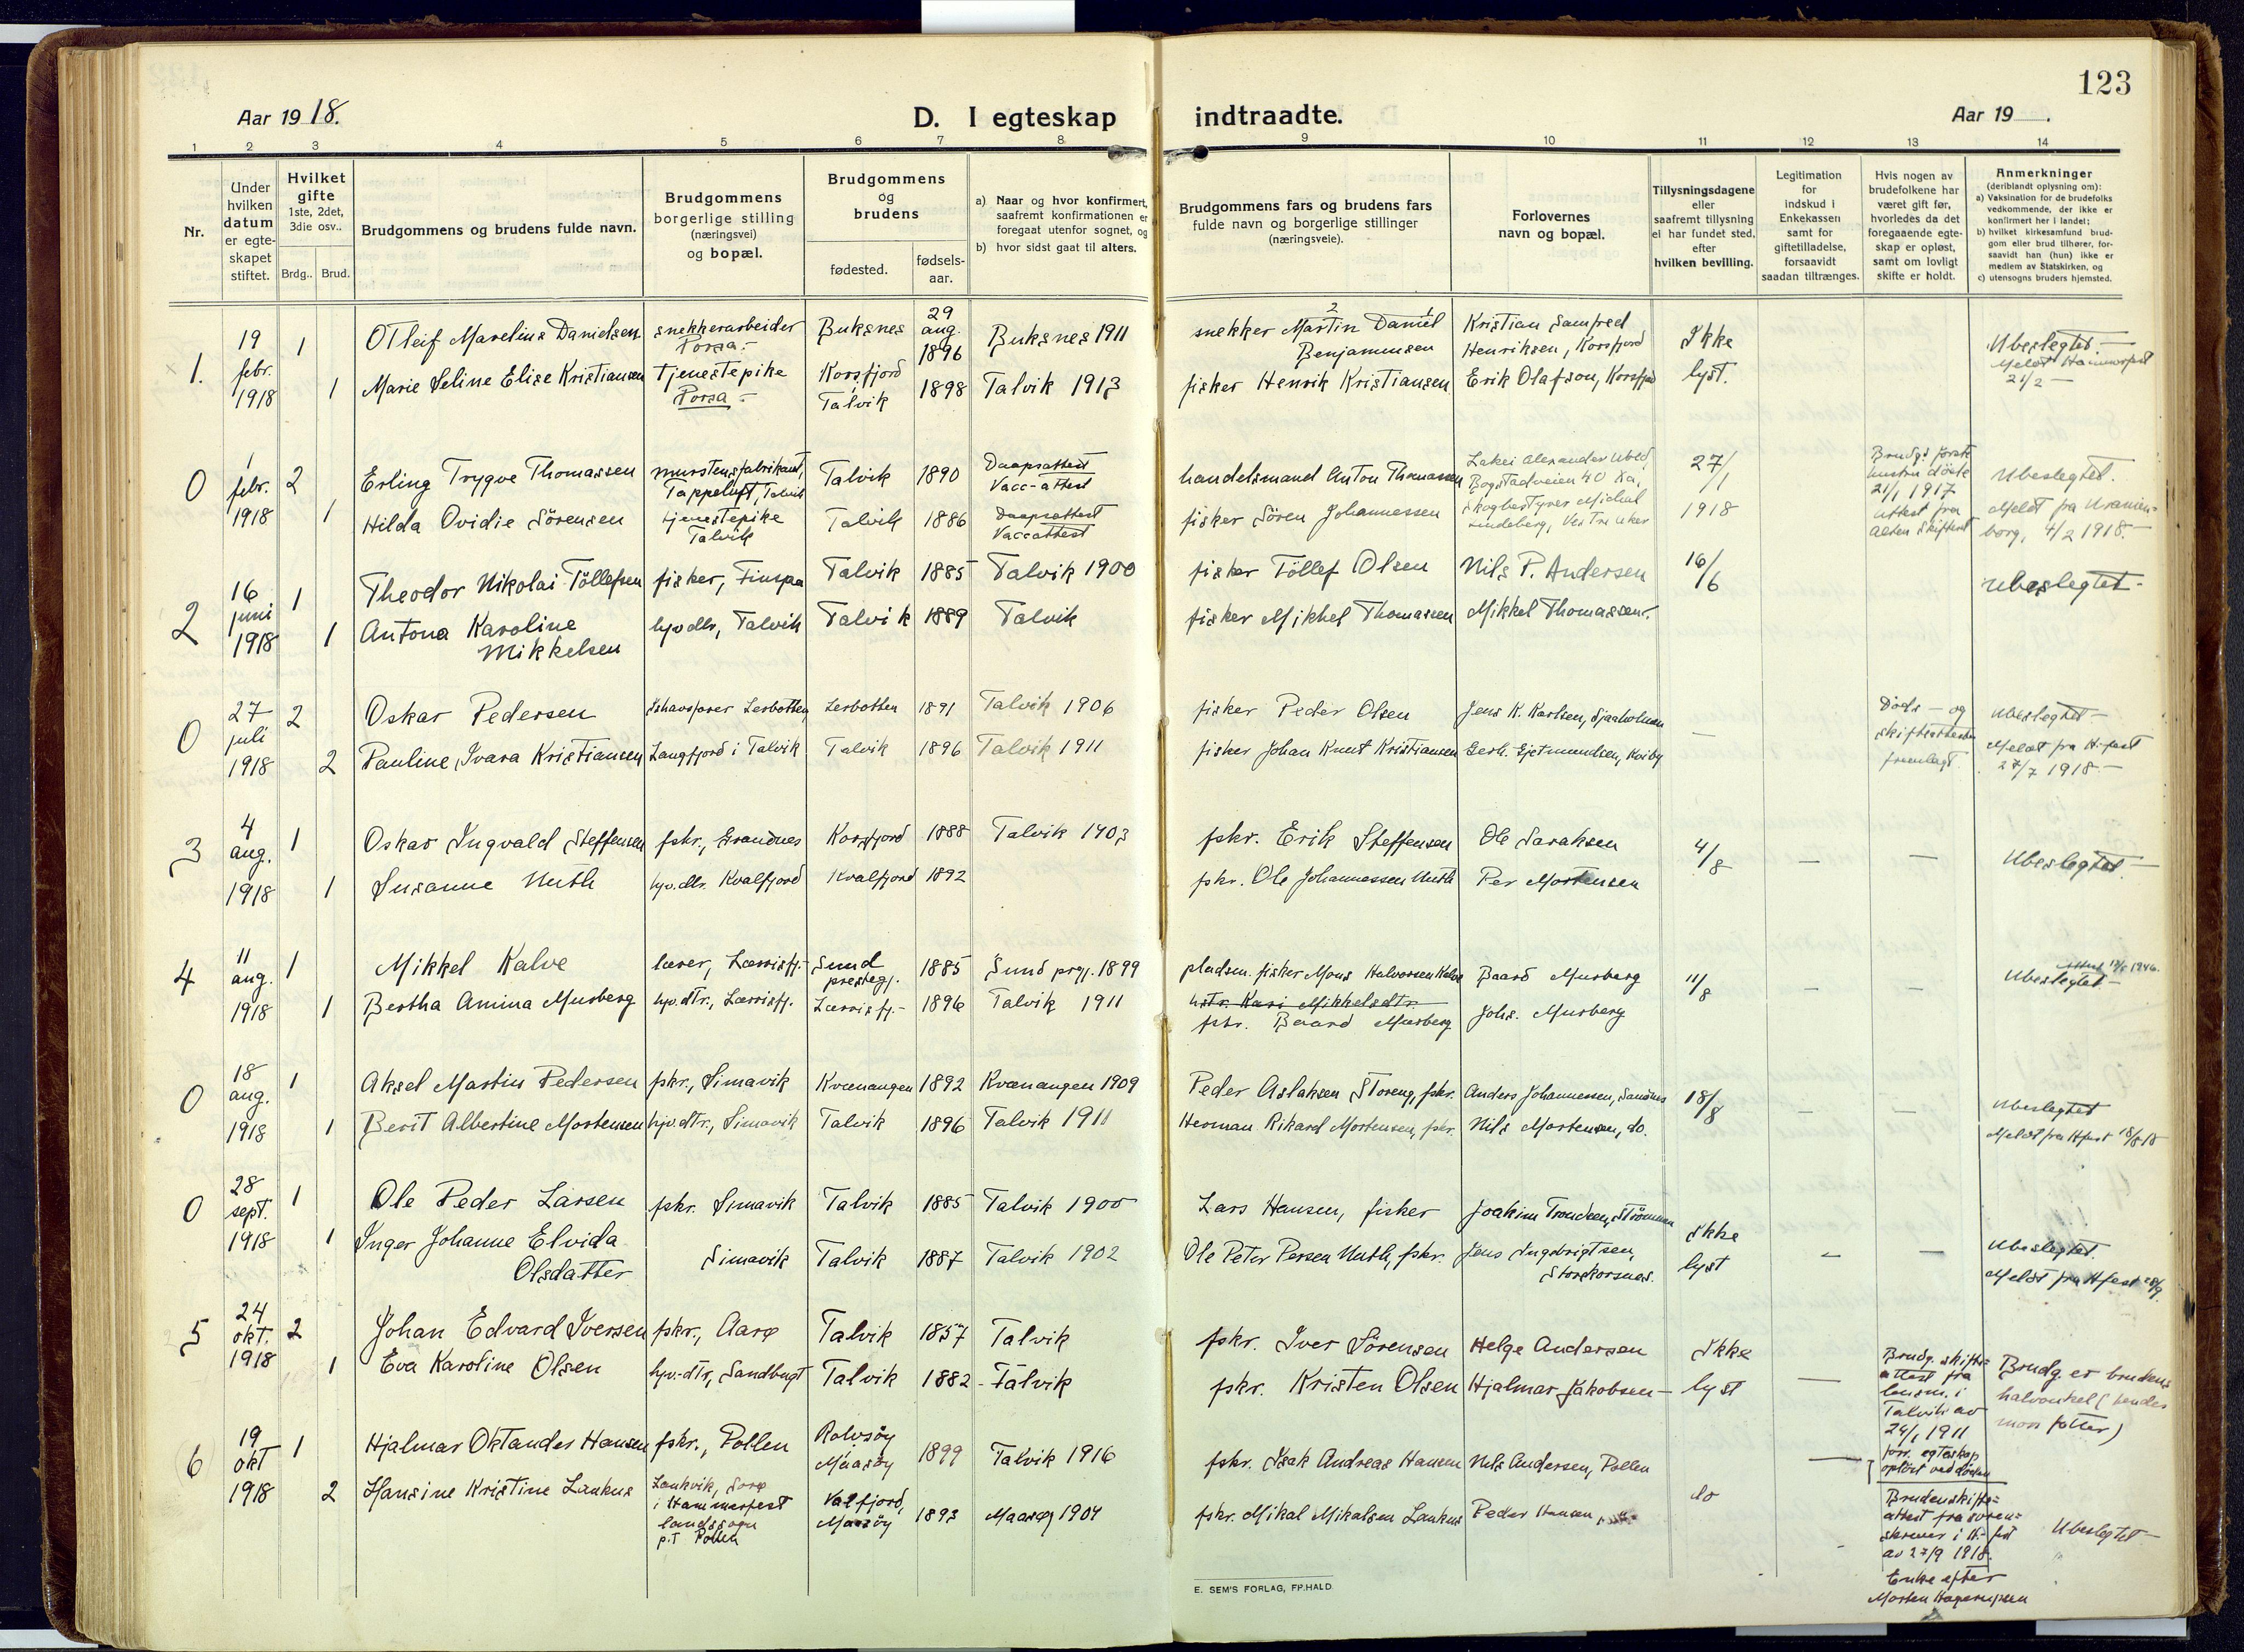 SATØ, Talvik sokneprestkontor, H/Ha/L0018kirke: Ministerialbok nr. 18, 1915-1924, s. 123